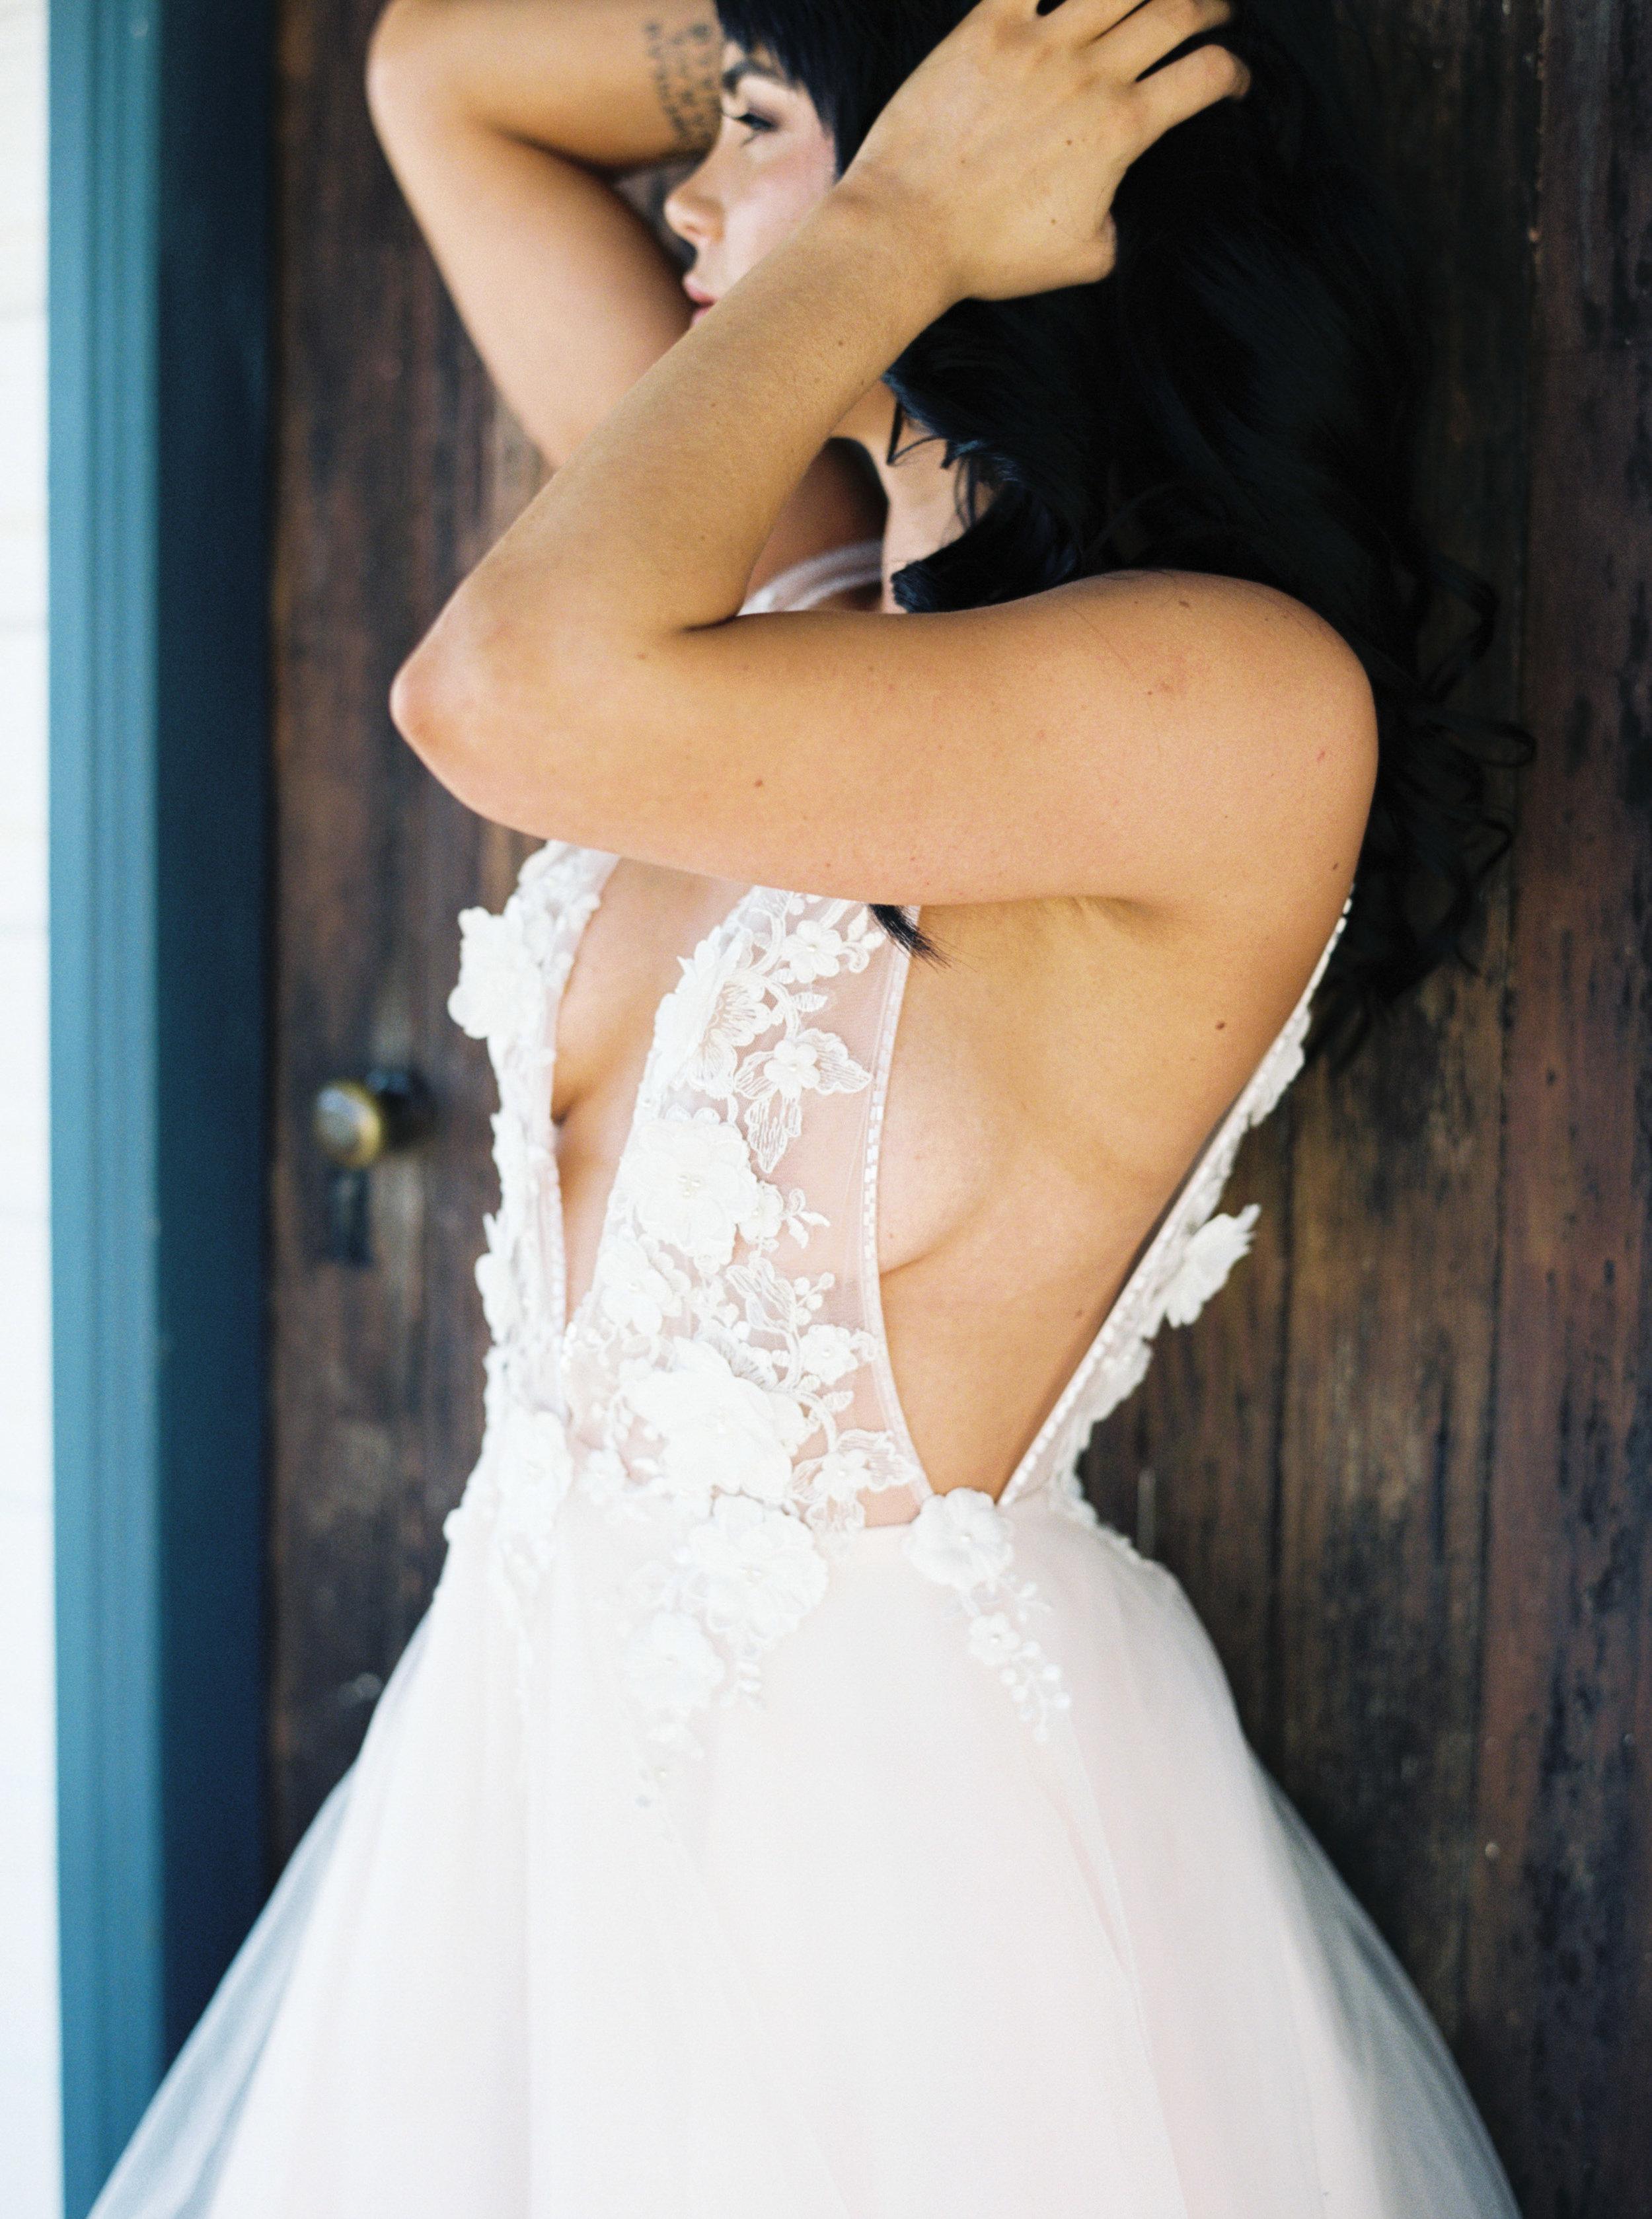 00027- Tamworth NSW Wedding Photographer Sheri McMahon-2.jpg